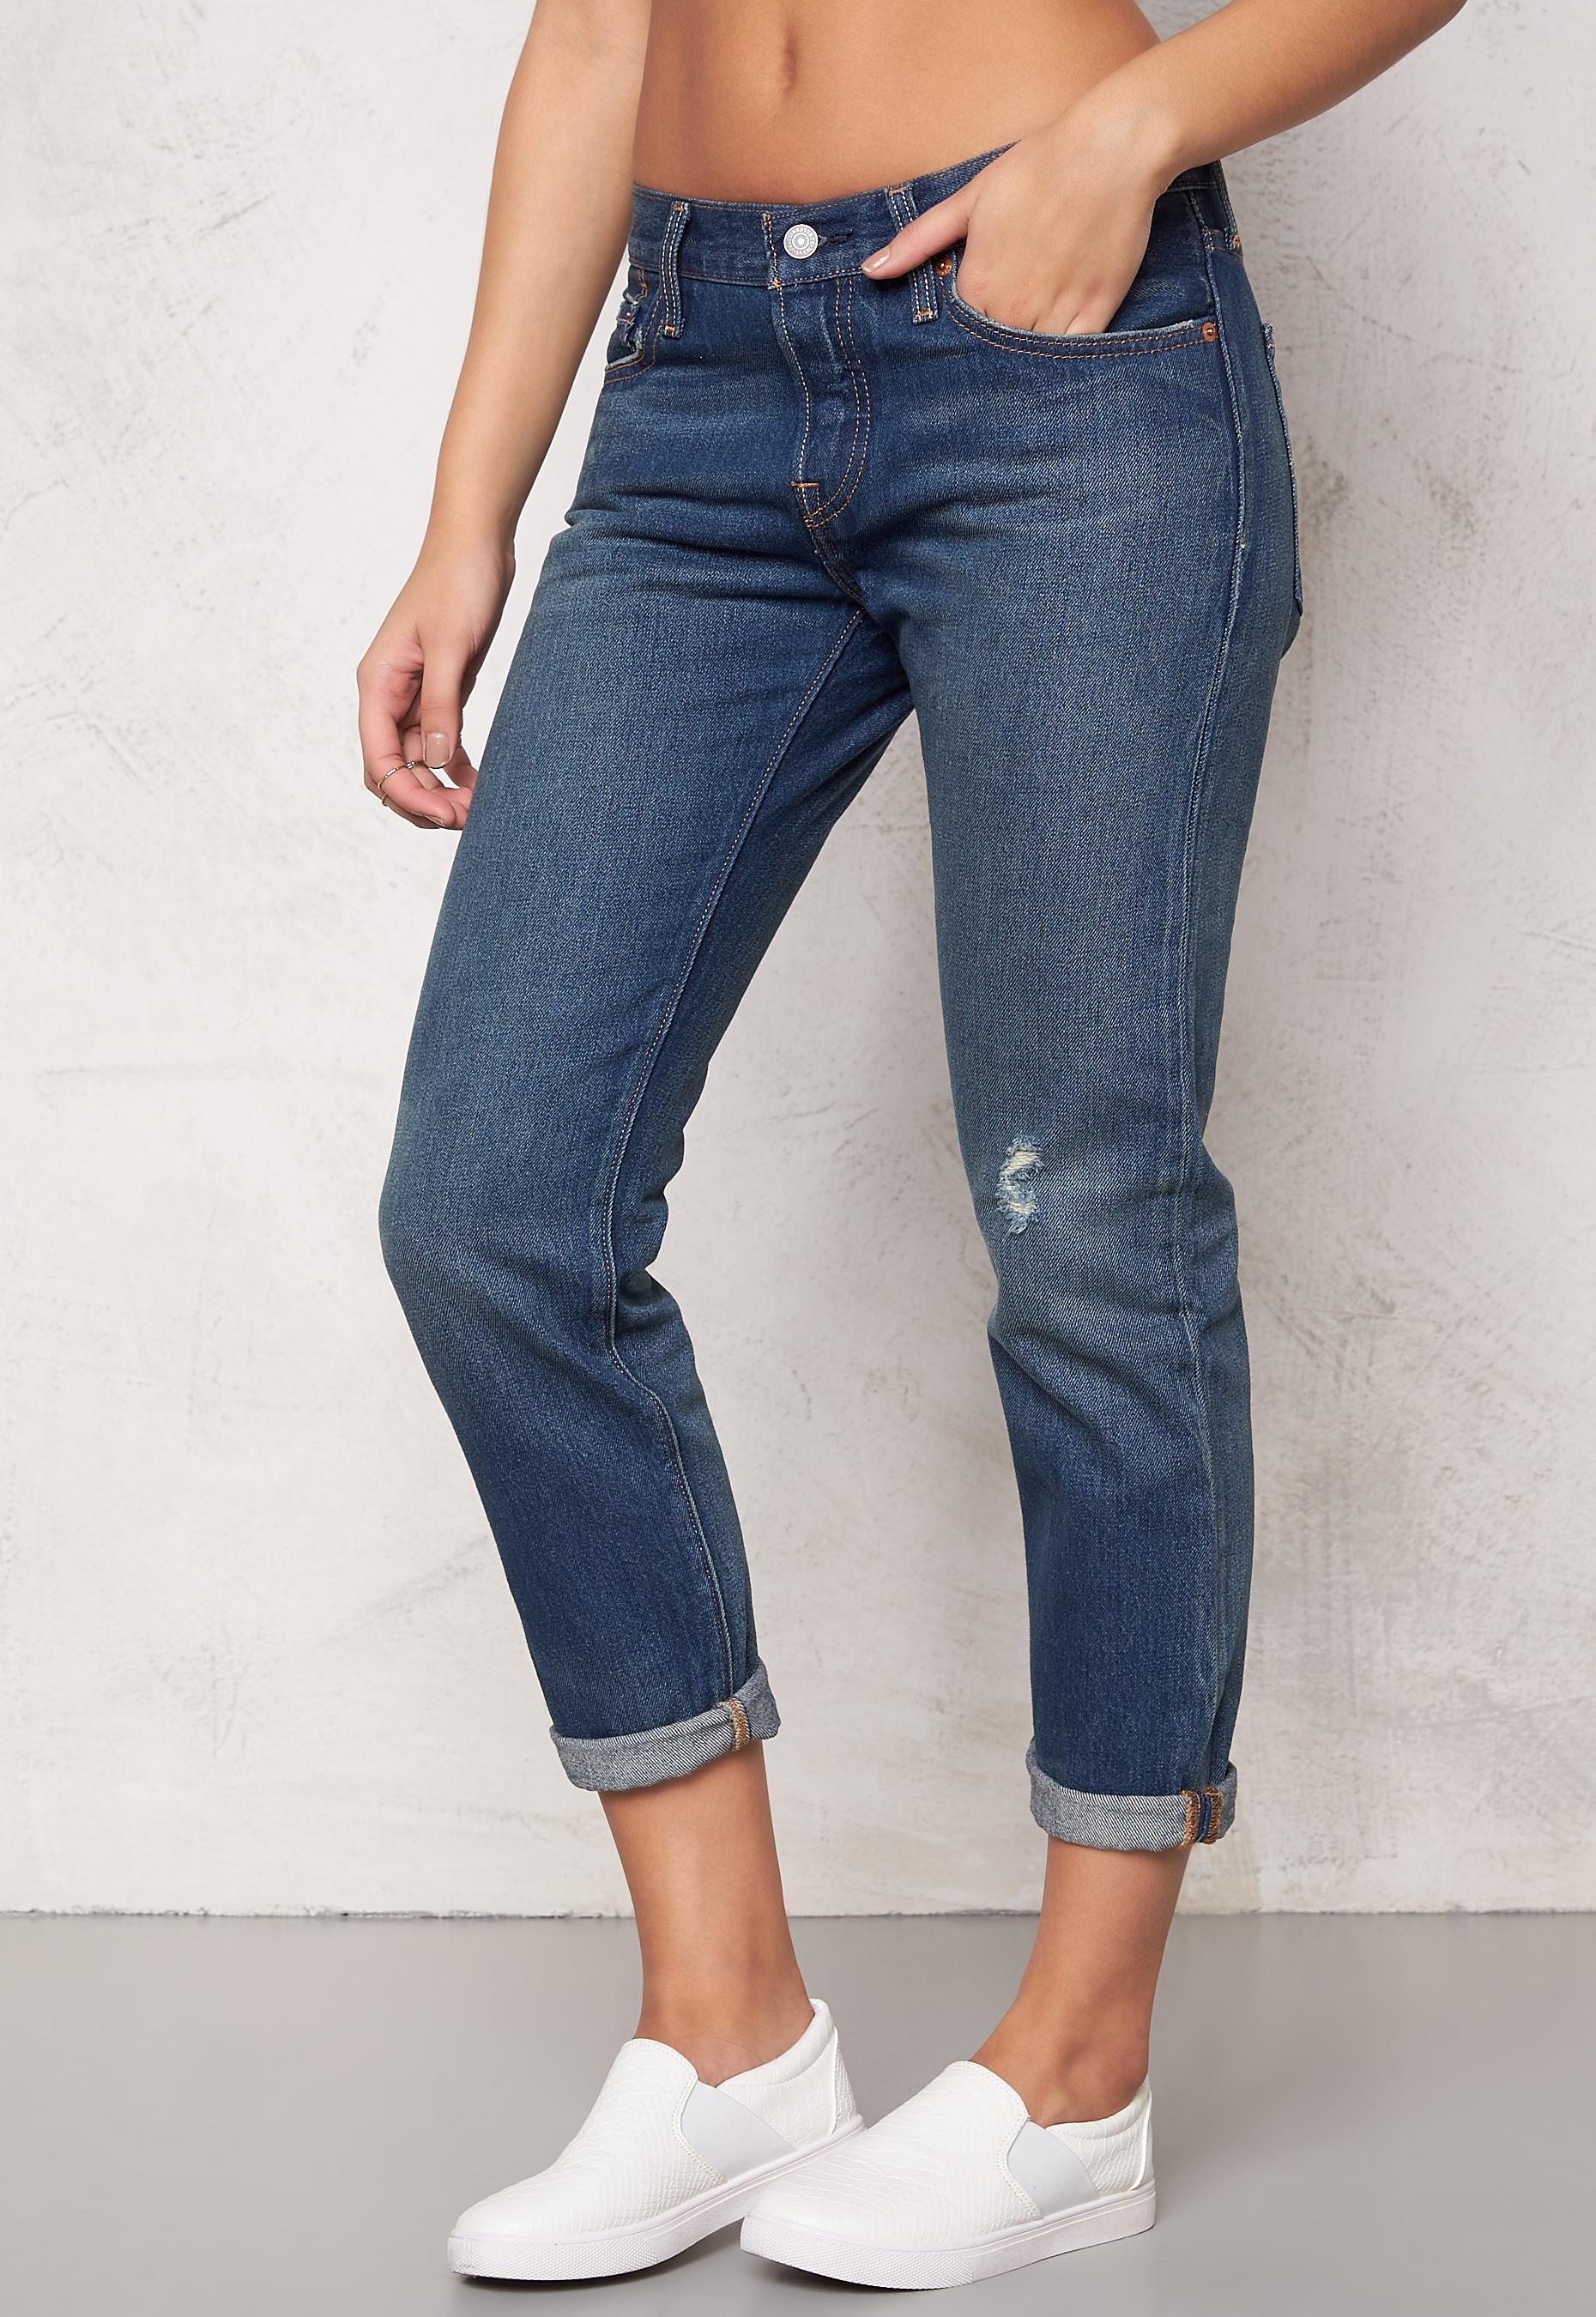 LEVI'S 501 CT Jeans Denim Cali Cool Bubbleroom